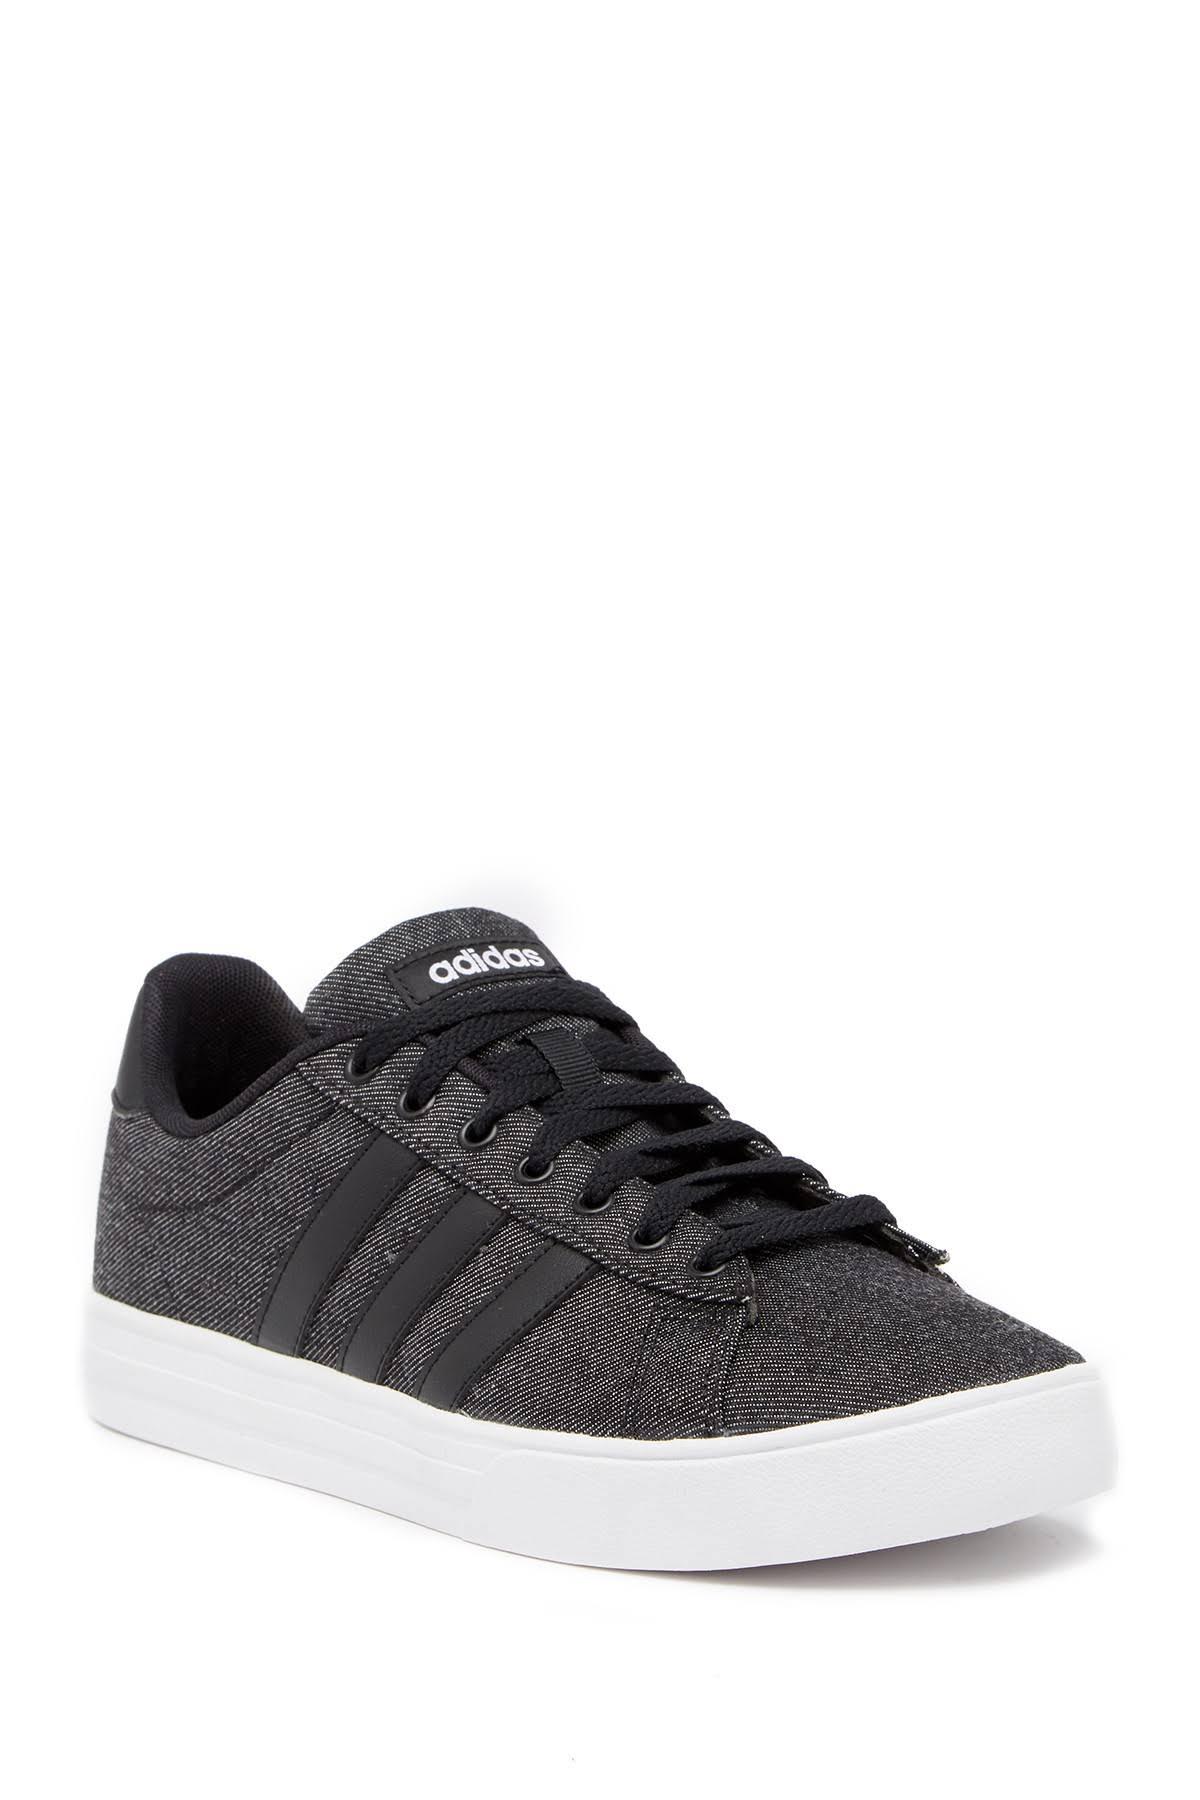 Negras Daily Adidas Zapatillas 8 Medianas 0 Hombre 1 2 Para 2 YWURdpnR